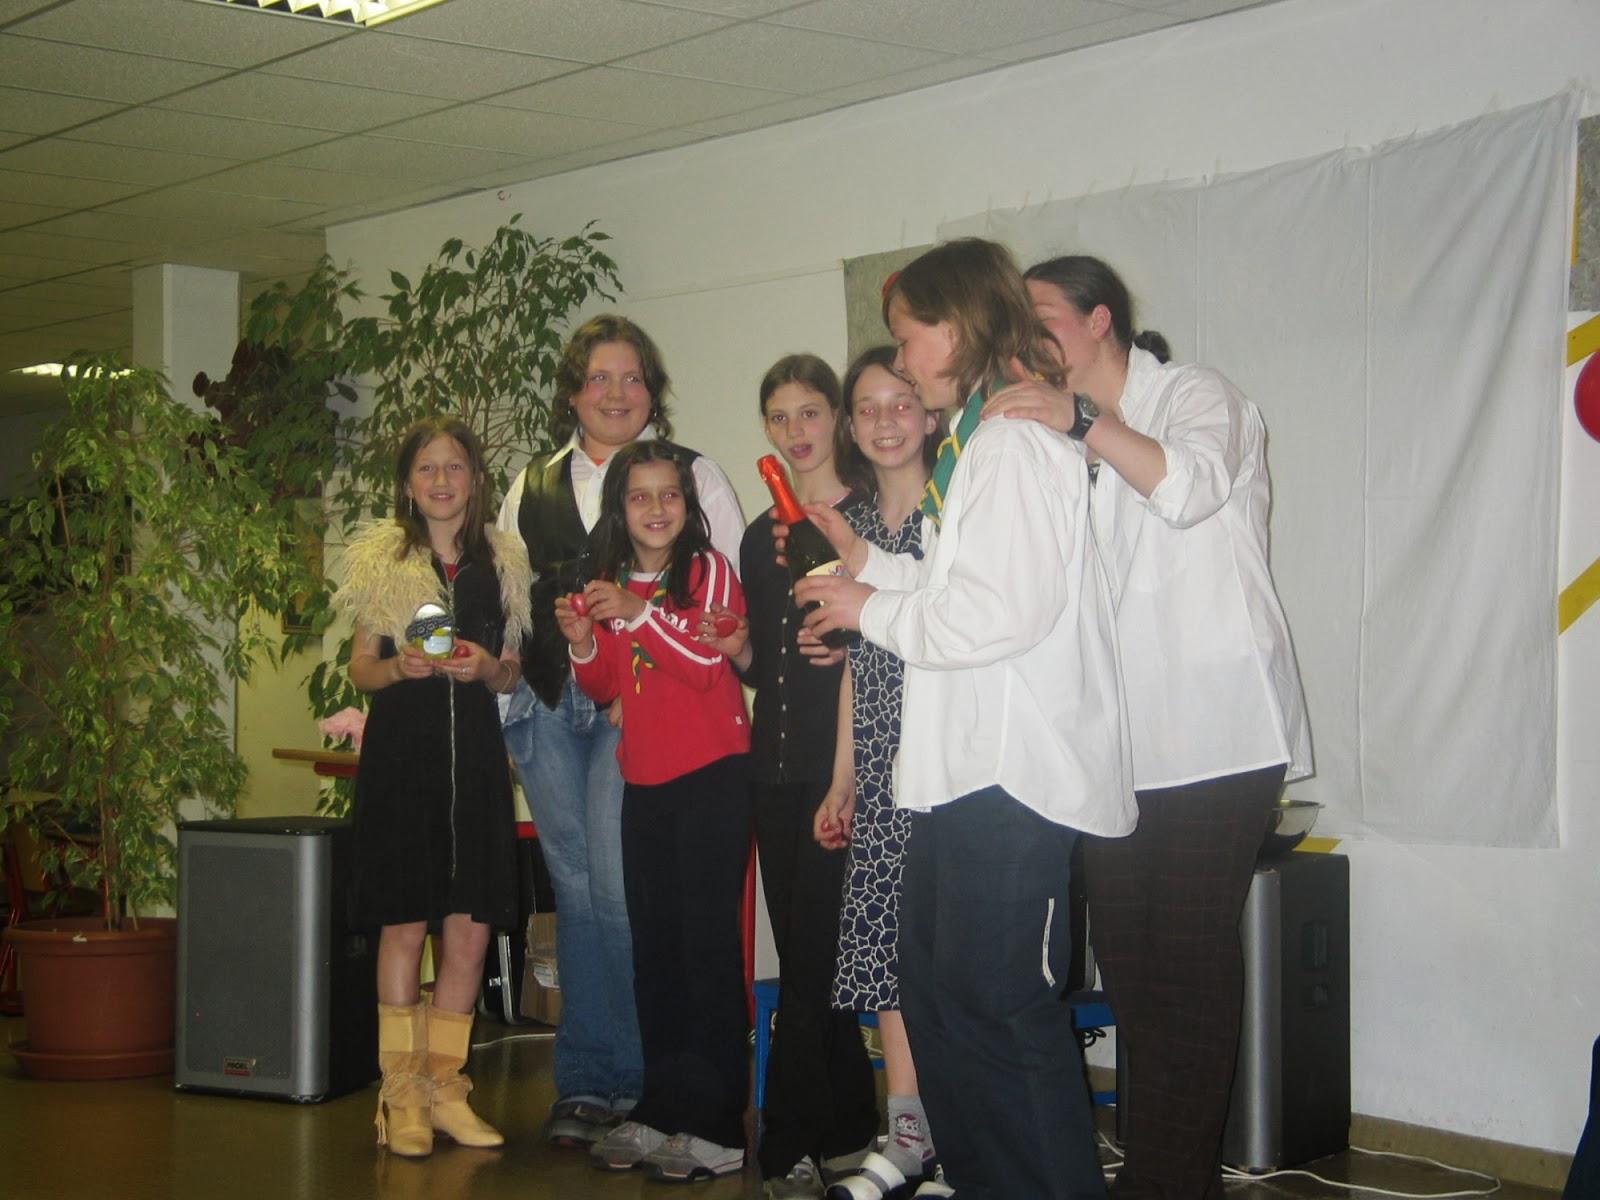 Tabosong, Ilirska Bistrica 2005 - Picture%2B010.jpg